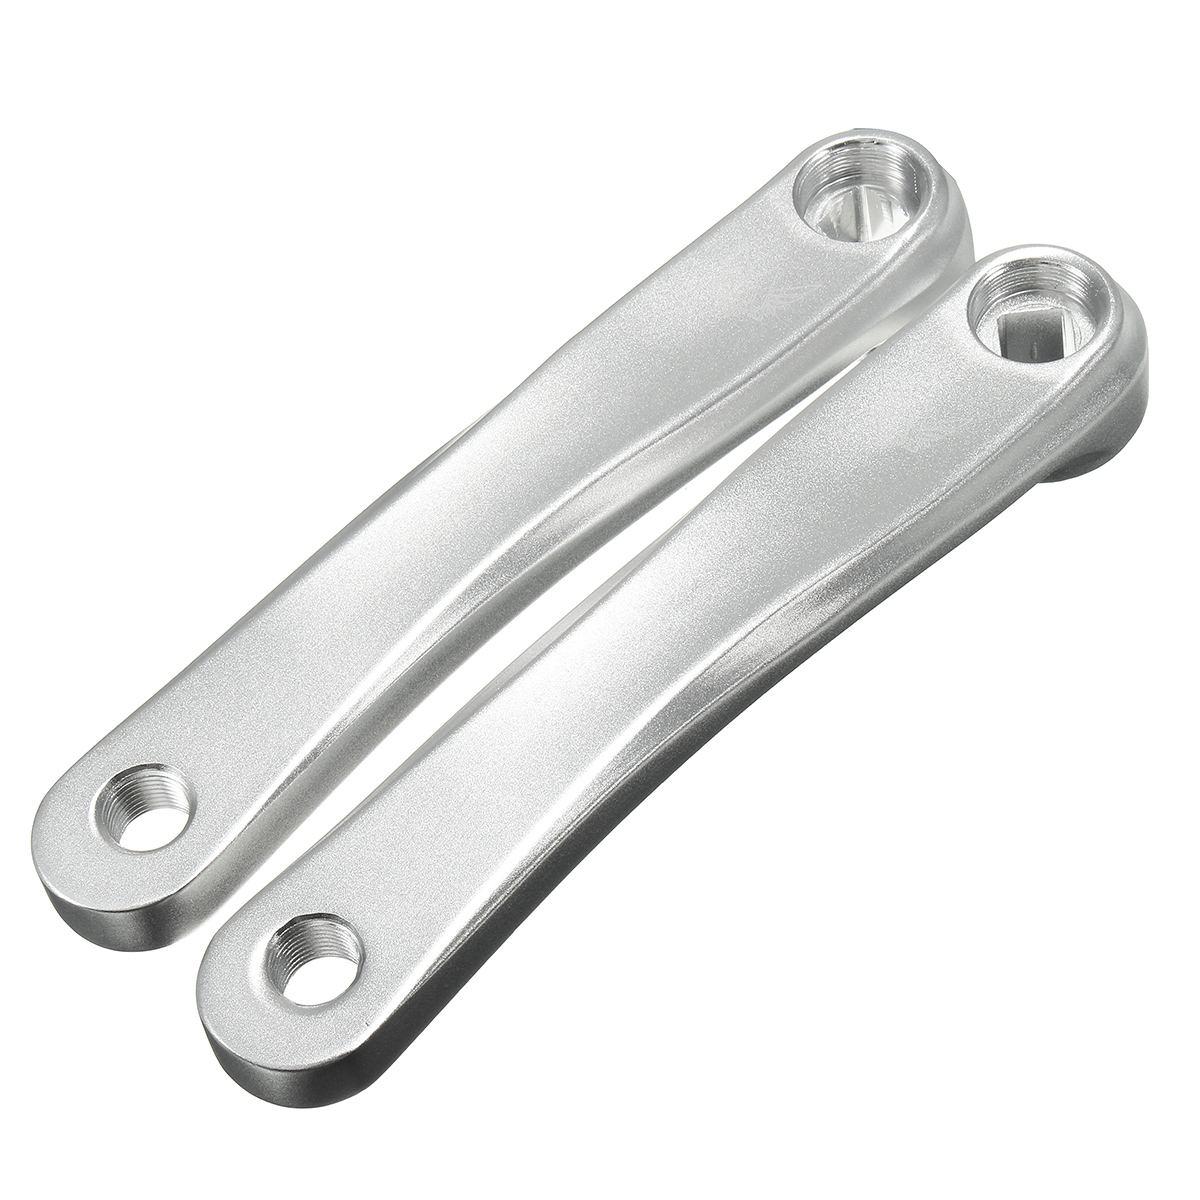 Aluminum Alloy Crank Leg 170mm Rhombus Hole Crank for MTB Bicycle Road Bike